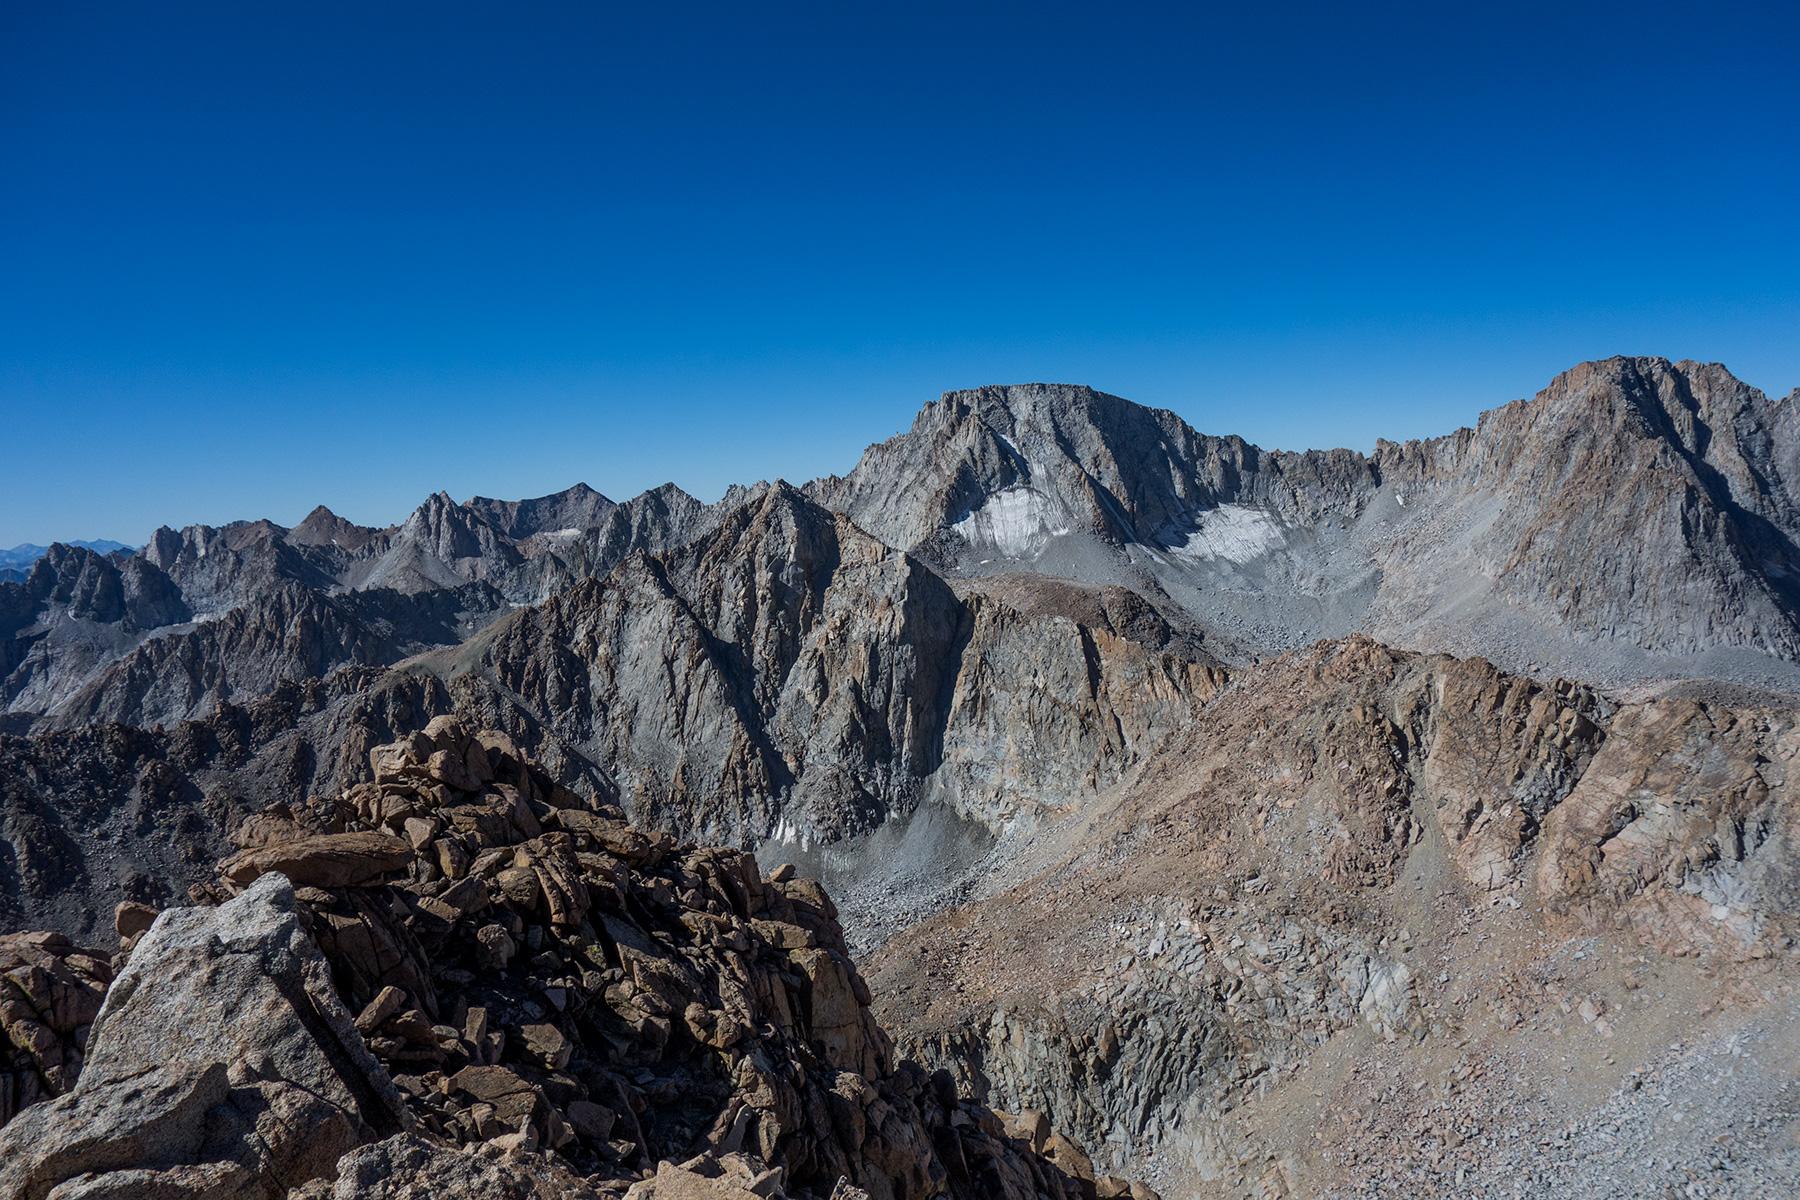 Lamarck Col HP (Peak 13172) – Photo Gallery